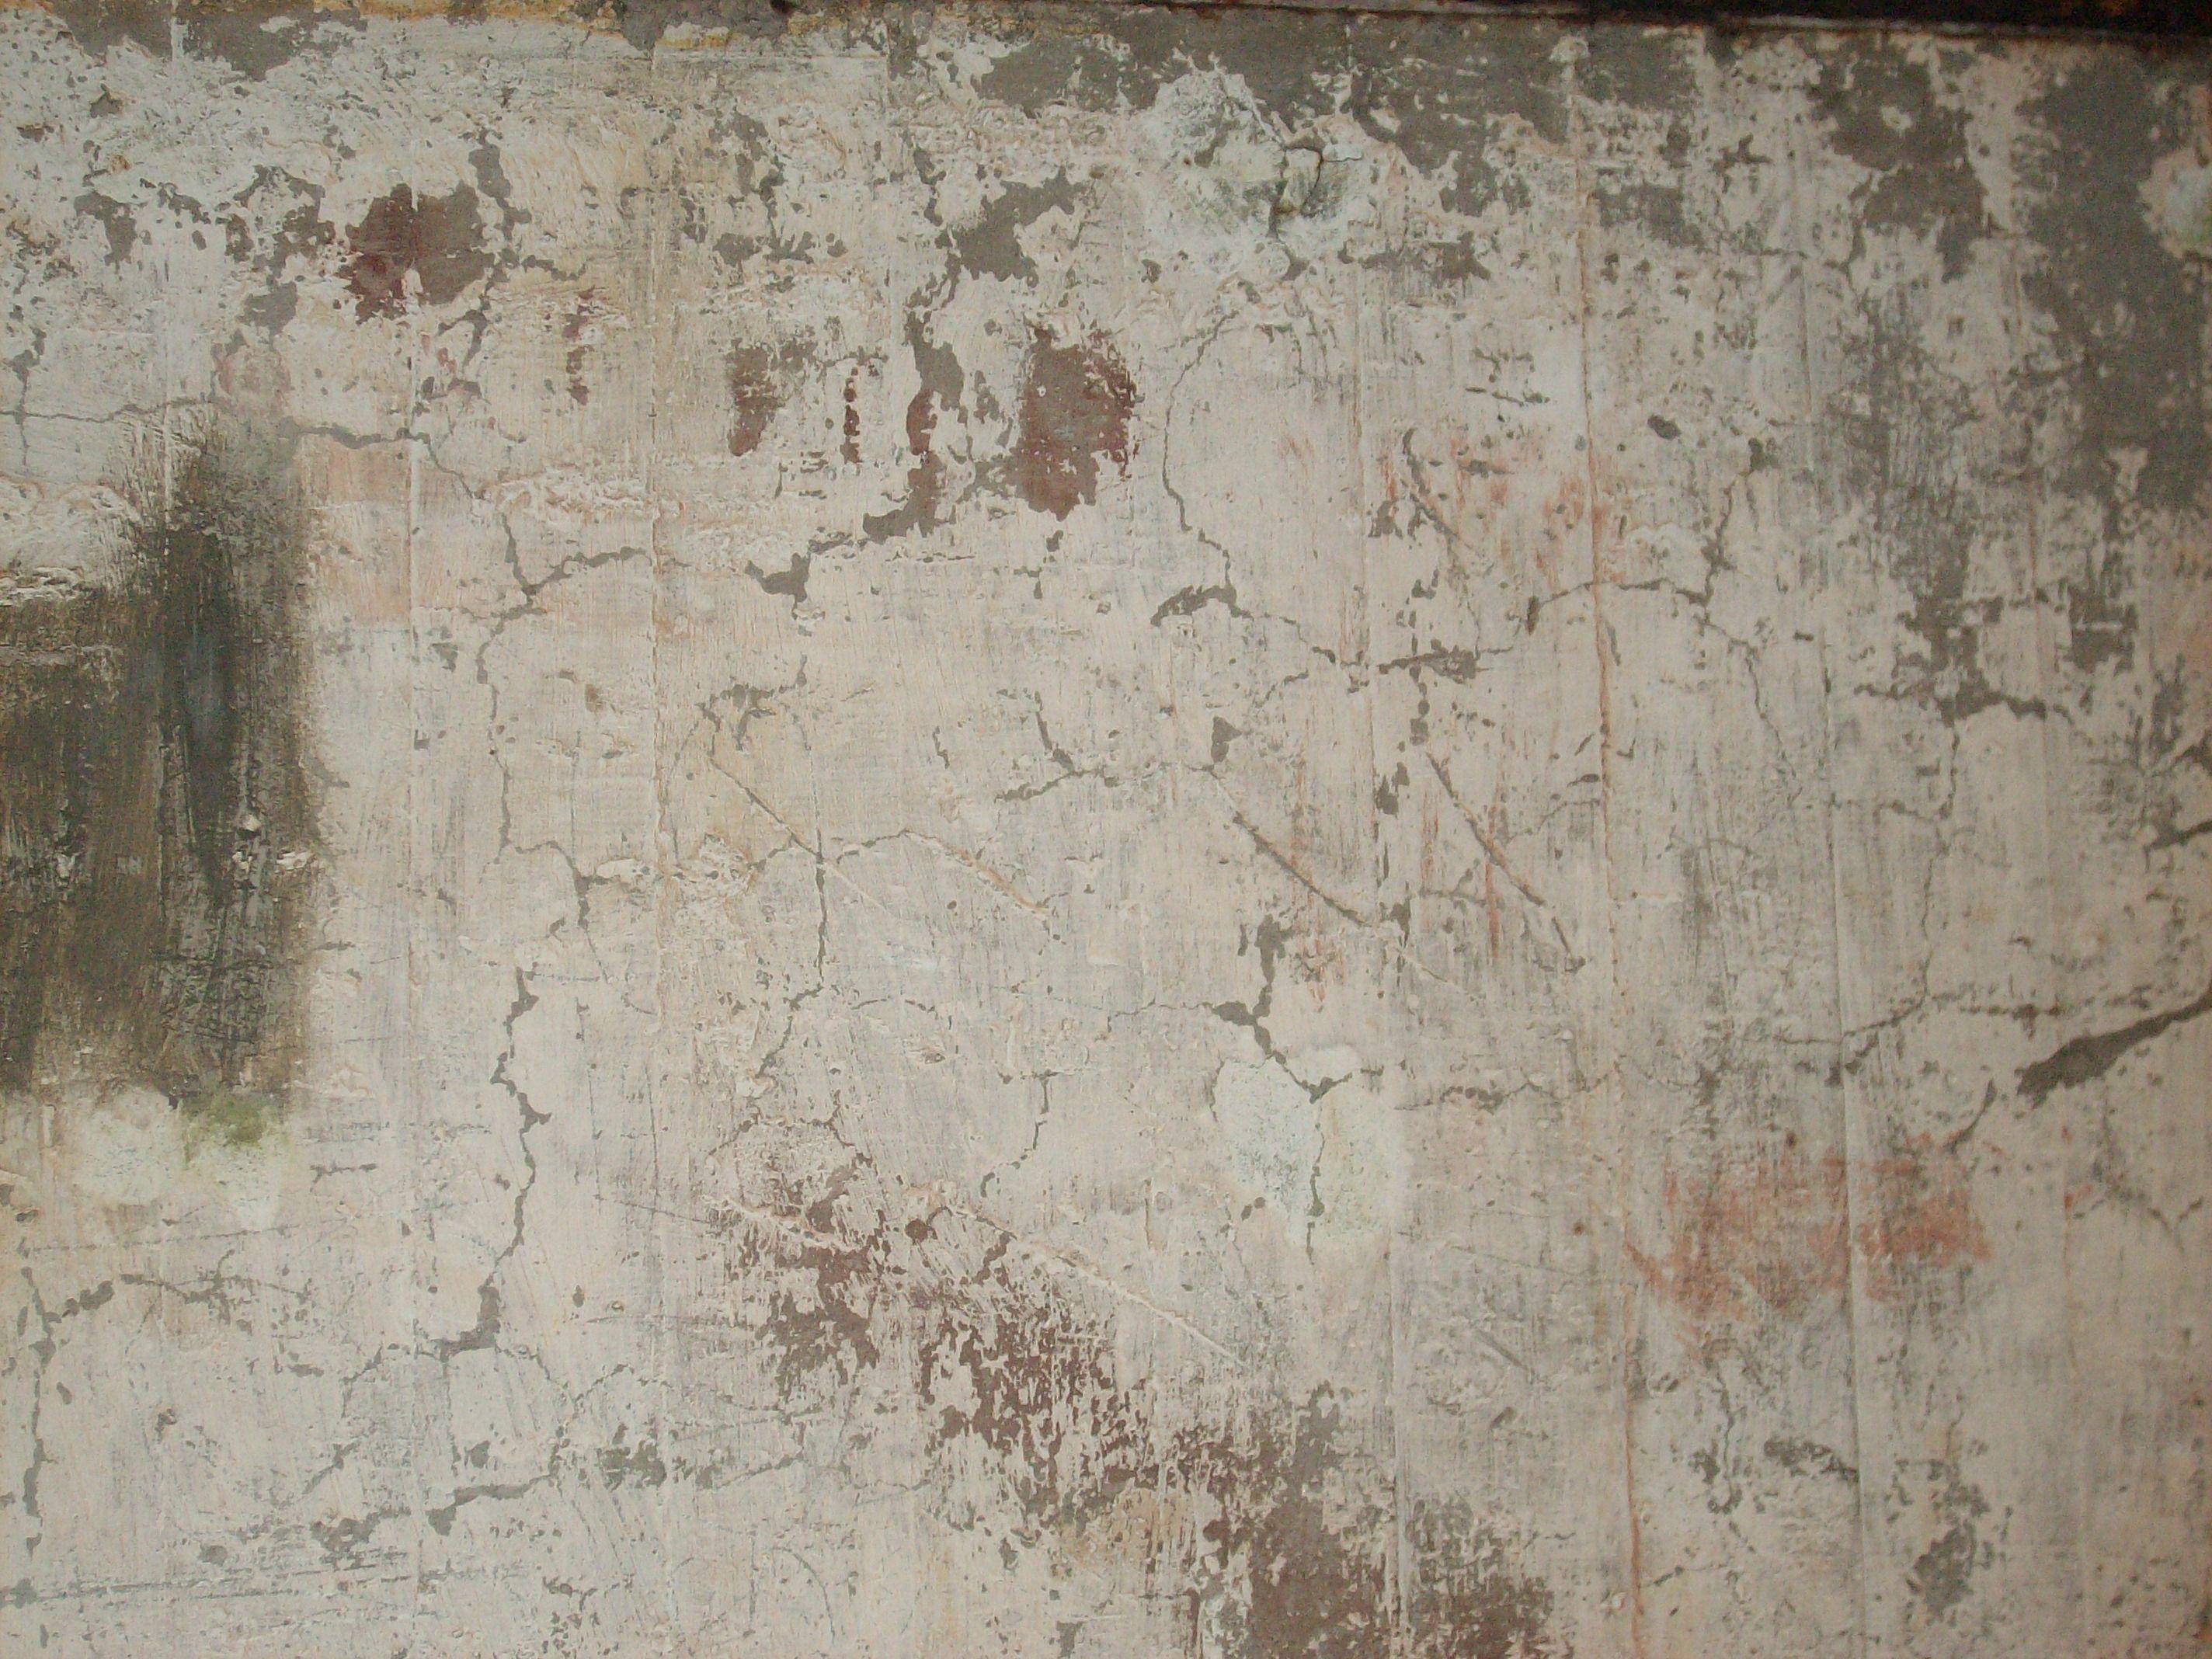 Milky Blast Concrete Wall Concrete Painting